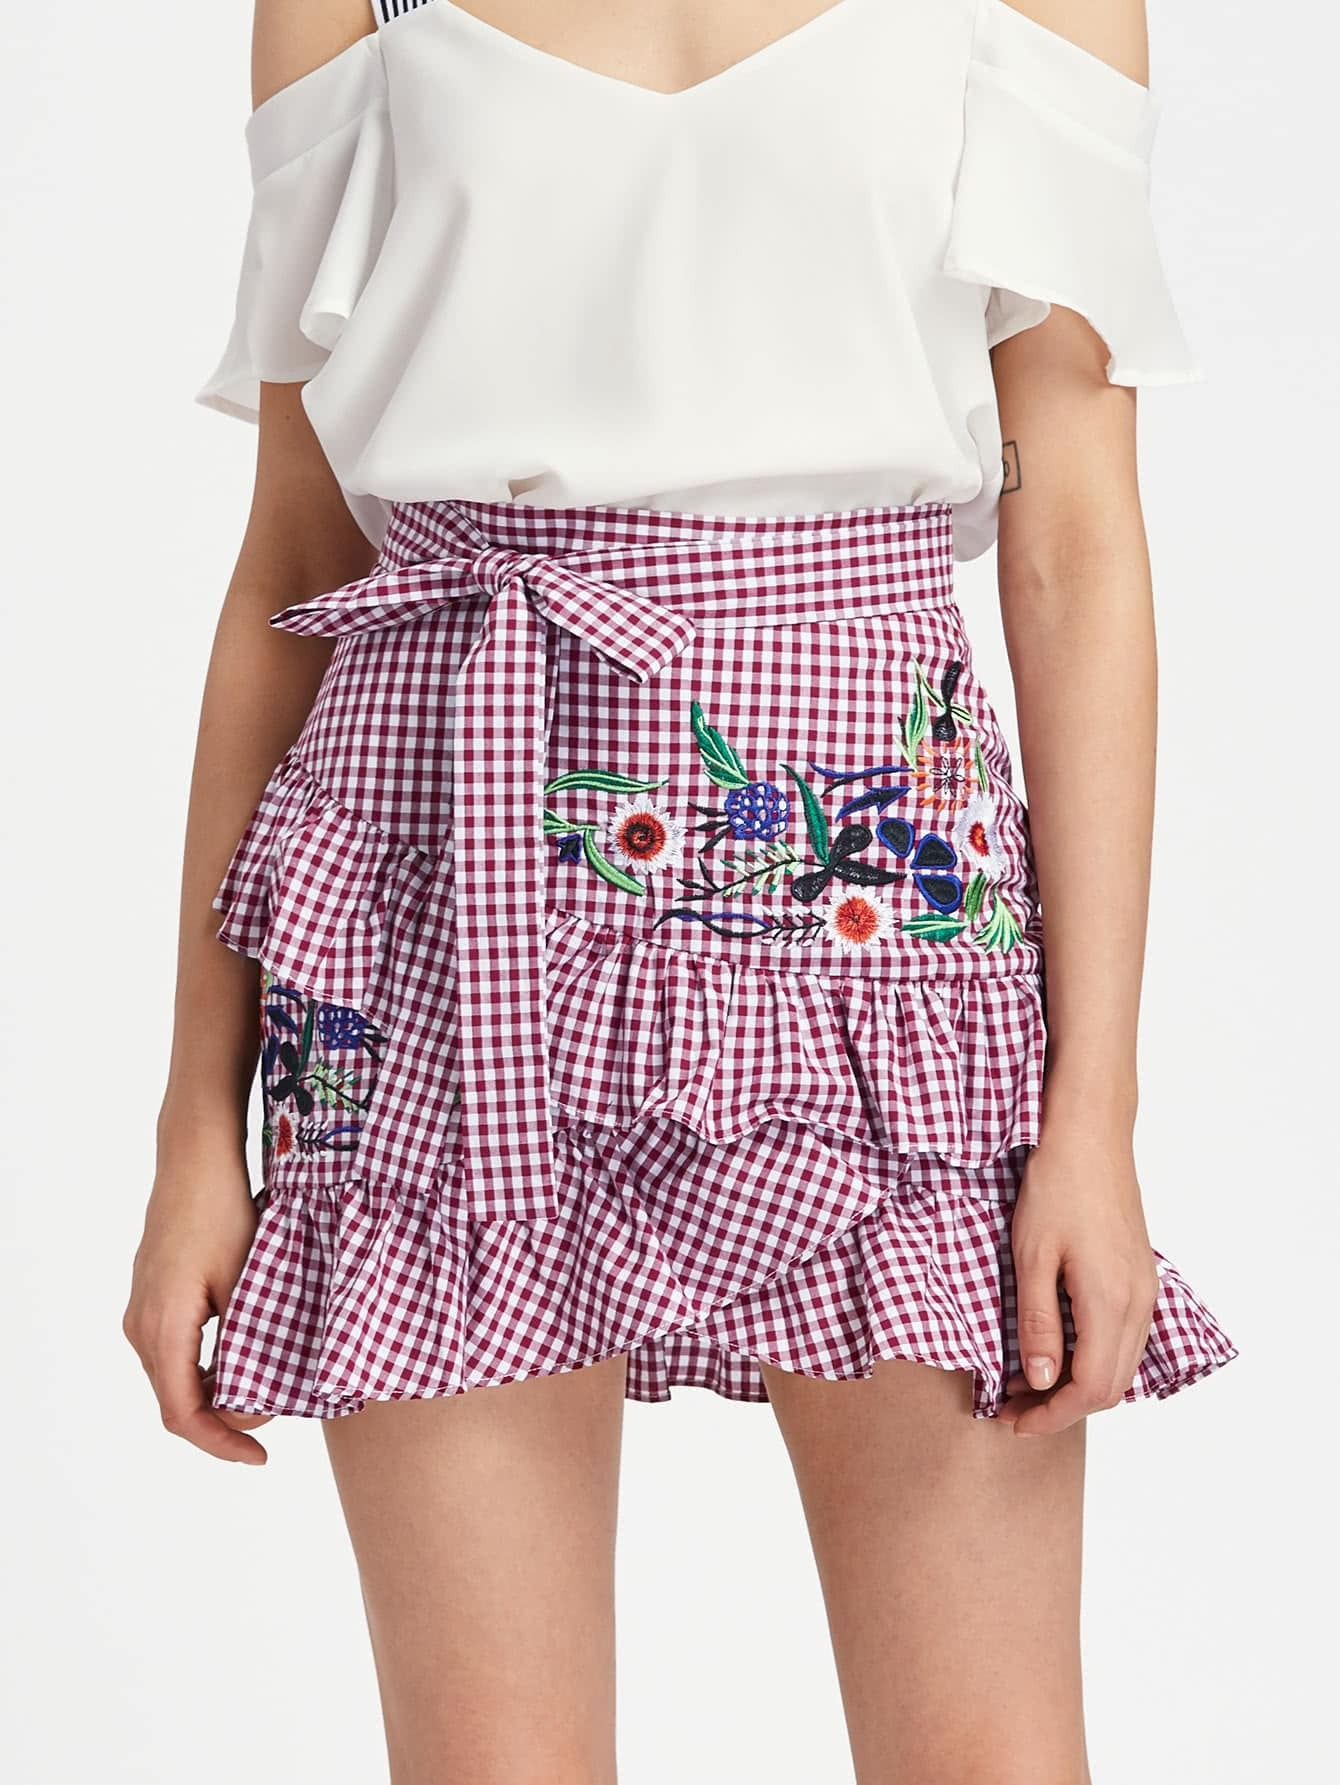 Self Belt Embroidered Asymmetric Ruffle Checkered Skirt